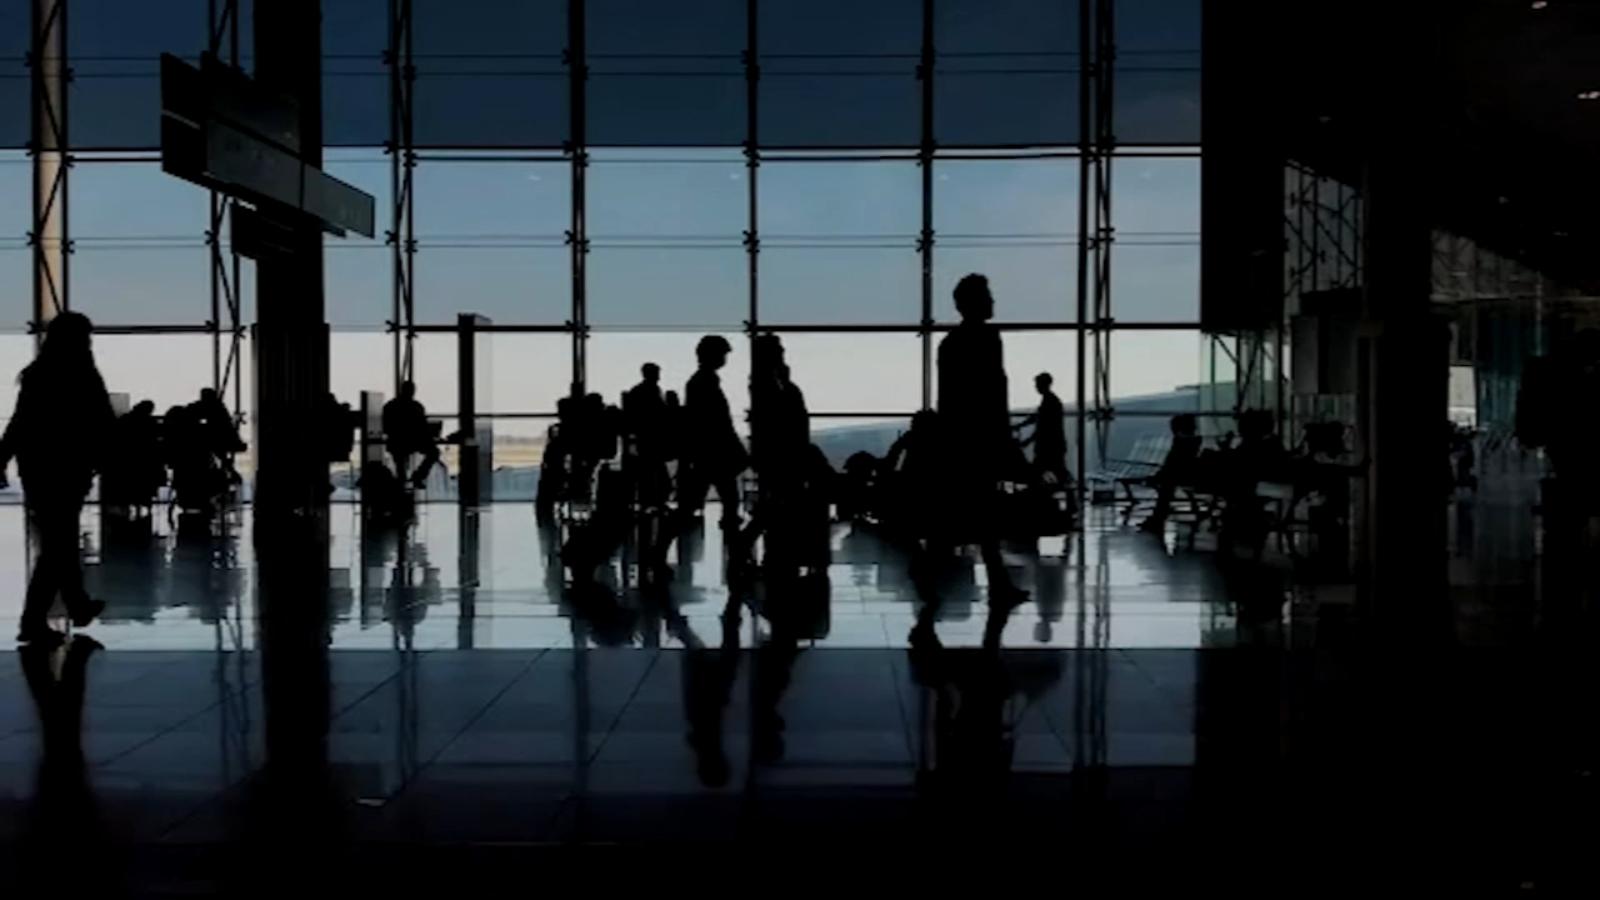 Revenge Travel: Travel agencies booking triple their pre-pandemic numbers - ABC11 Raleigh-Durham